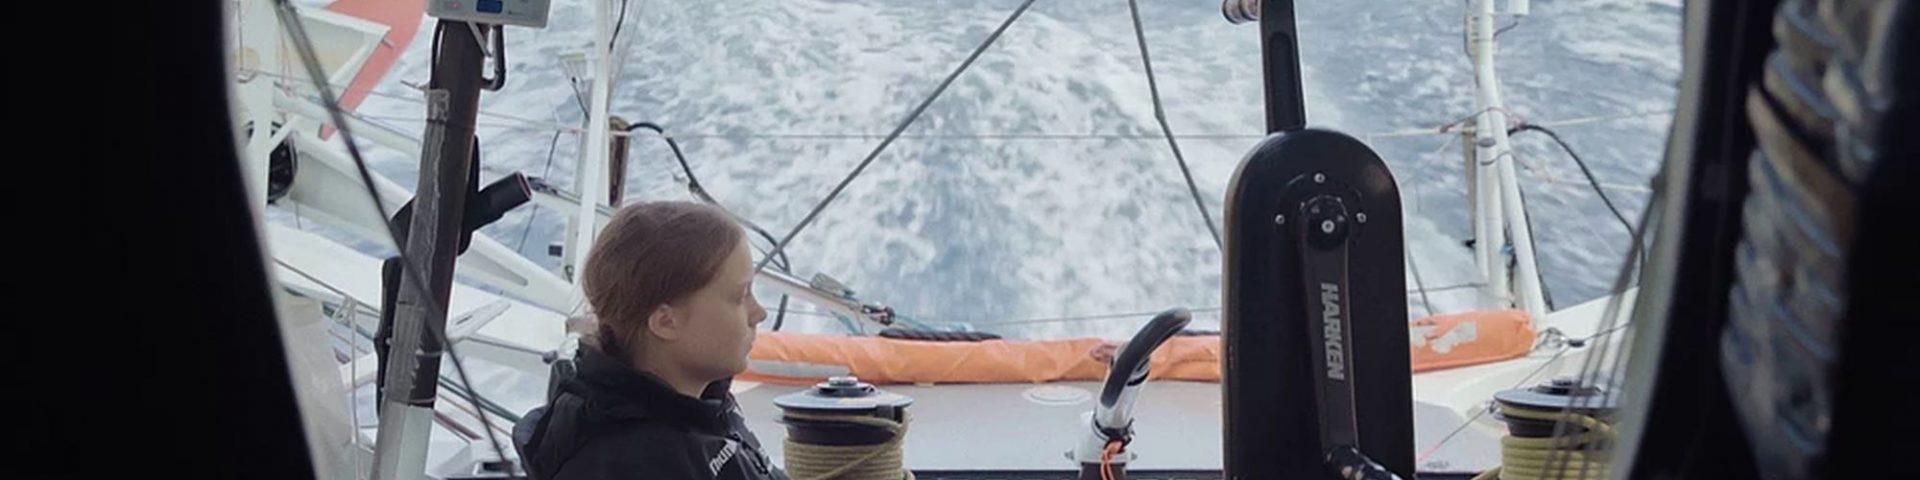 I am Greta: arriva il documentario su Greta Thunberg (Trailer)